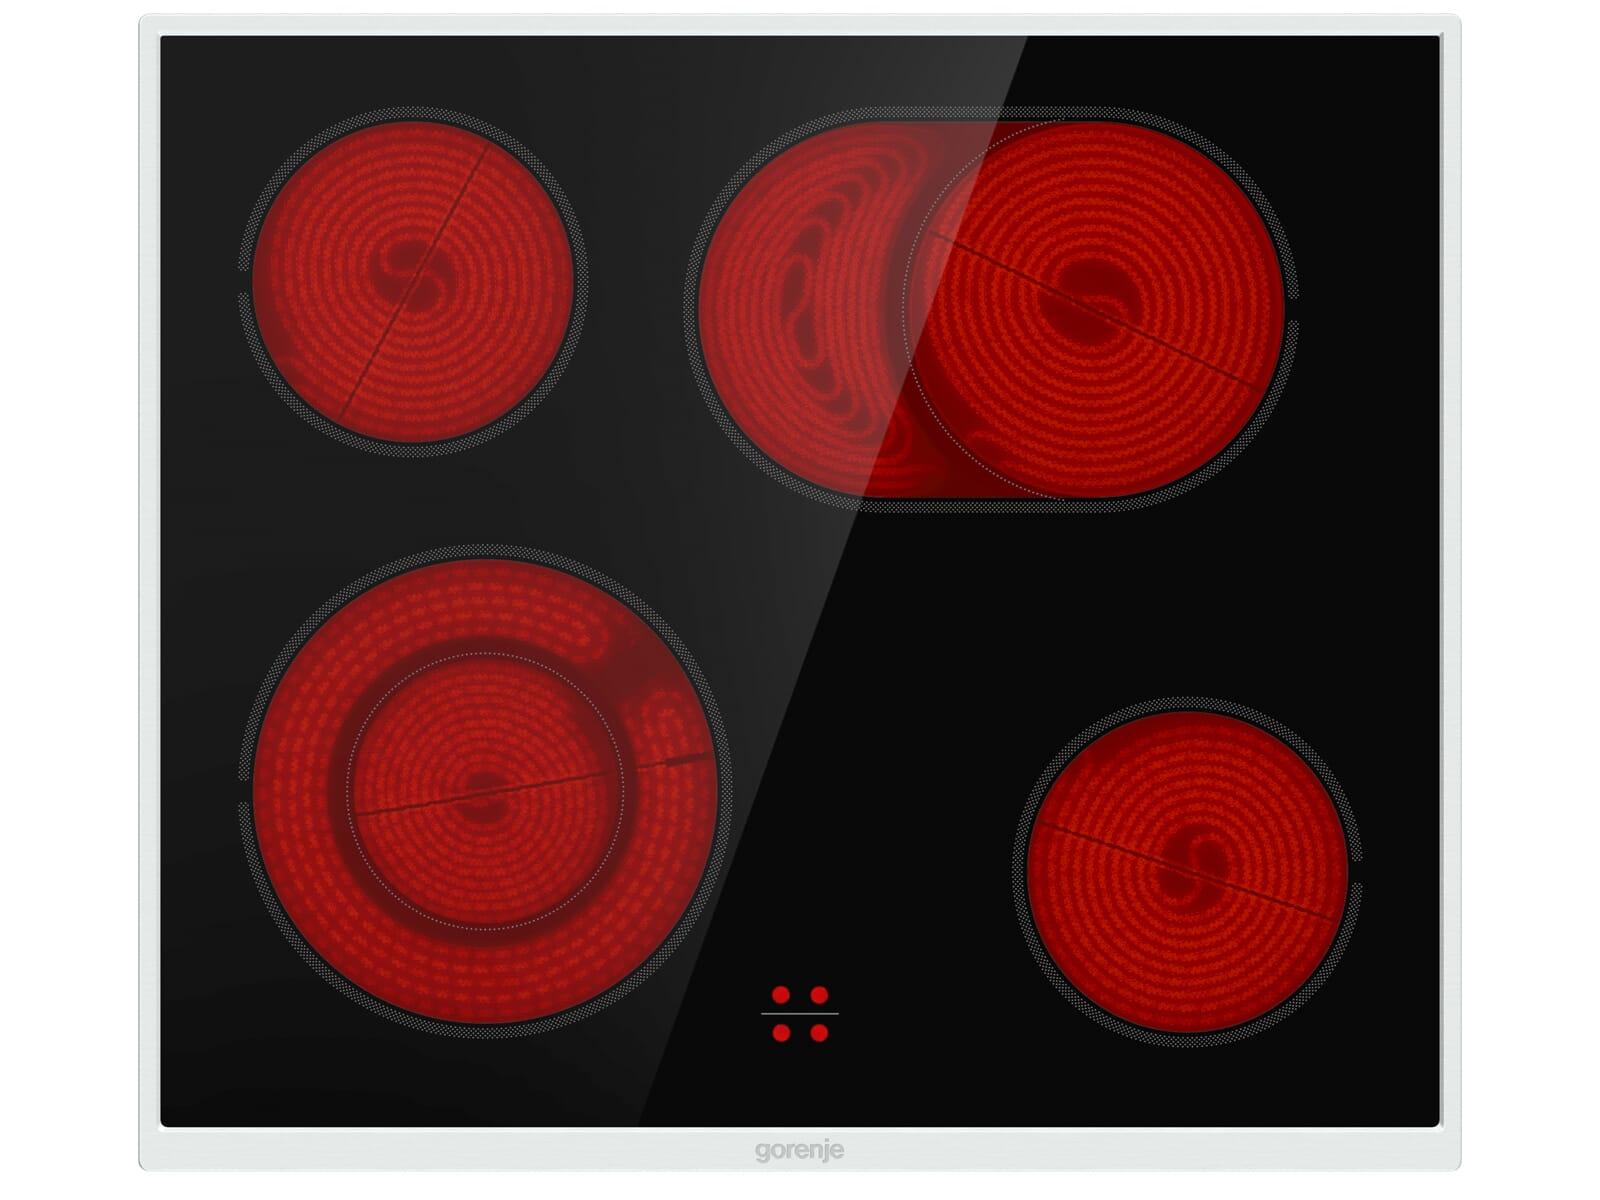 Gorenje Red Pepper Set 7N Einbauherd BC 615 E19XK-2 + Glaskeramikkochfeld ECD 643 BX